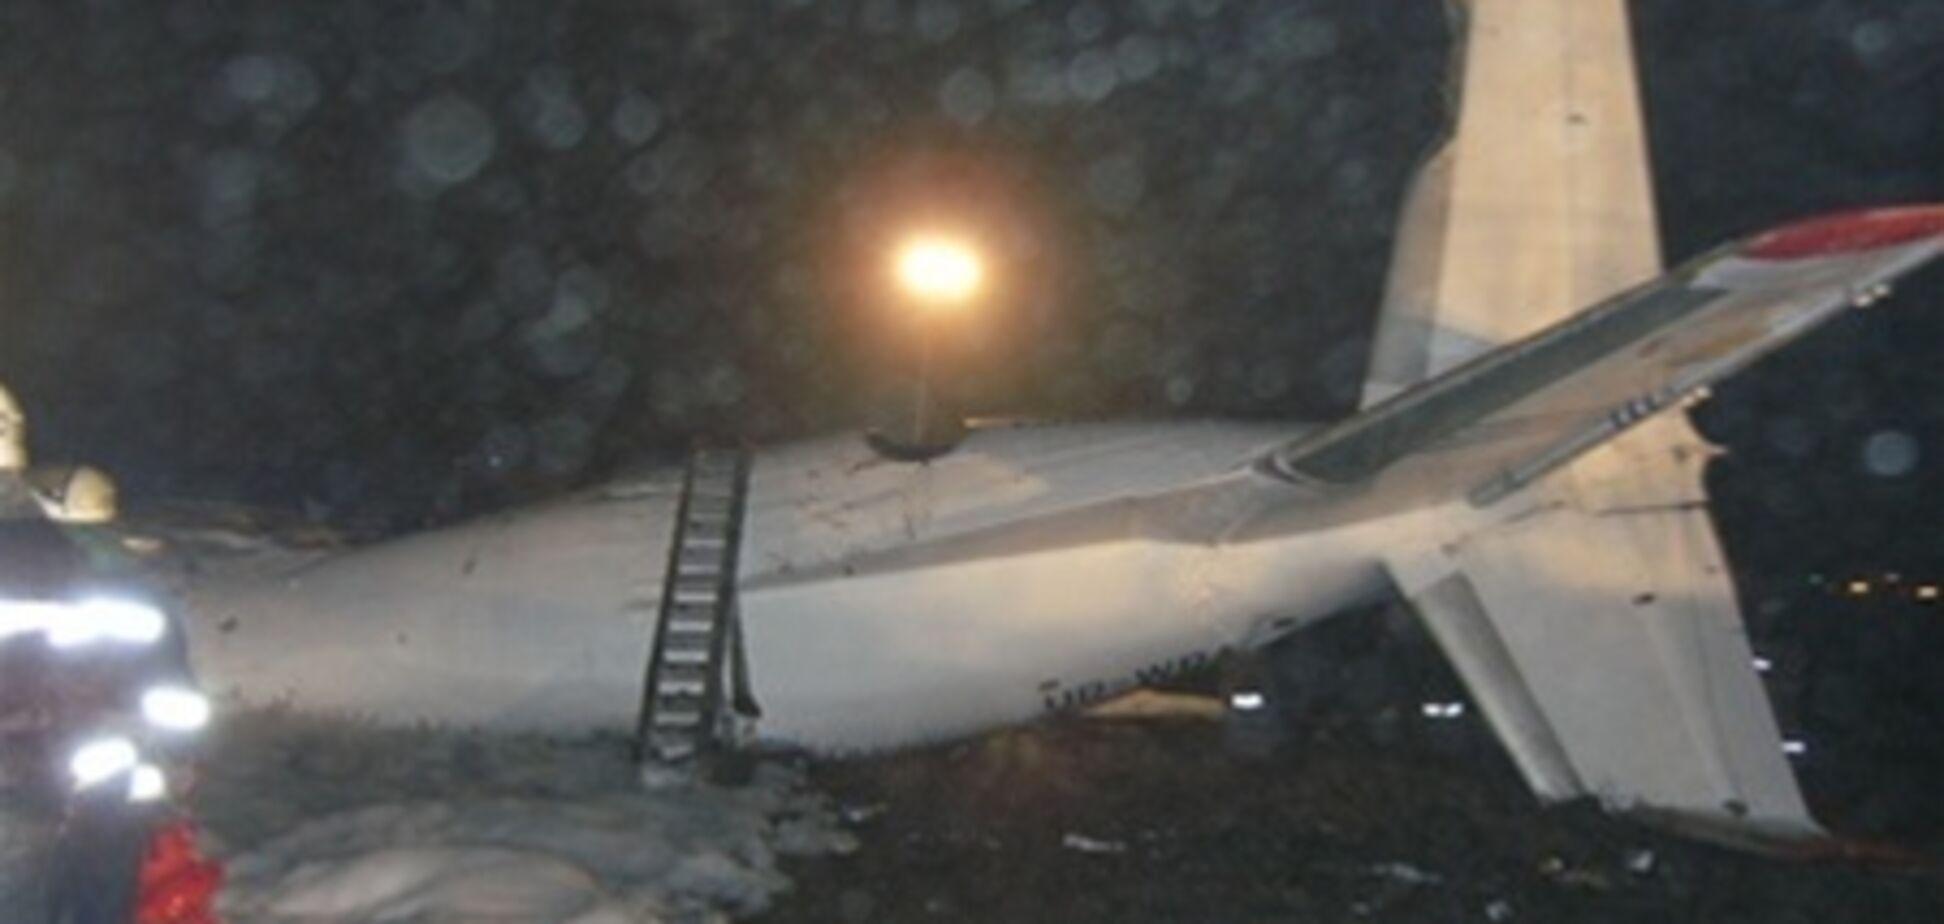 Метеоумови дозволяли Ан-24 скоїти безпечну посадку - аеропорт Донецька